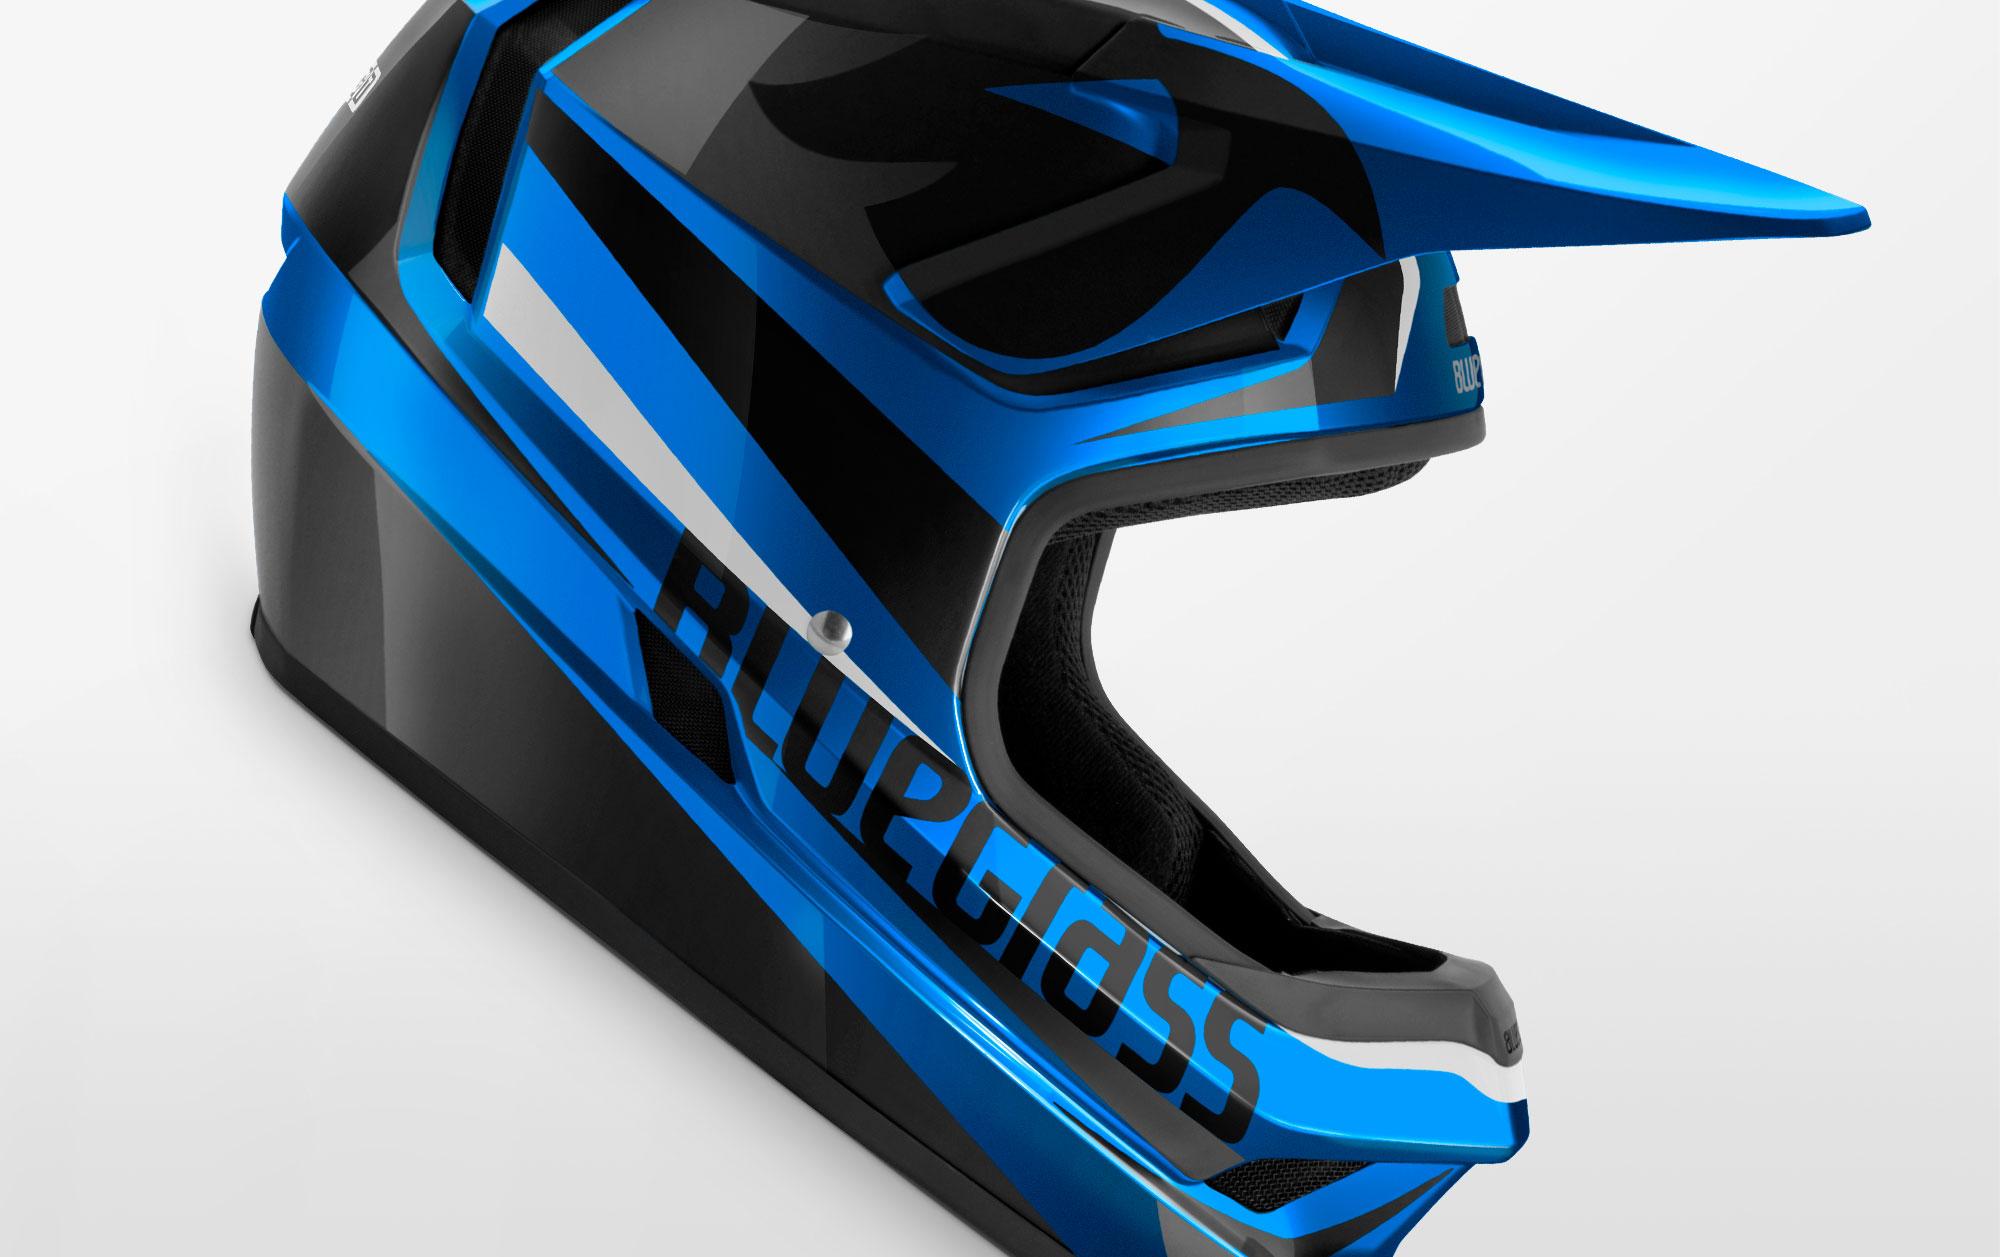 56-58 f/ür Erwachsene Met Fahrradhelm Bluegrass Legit Petro Unisex Blau